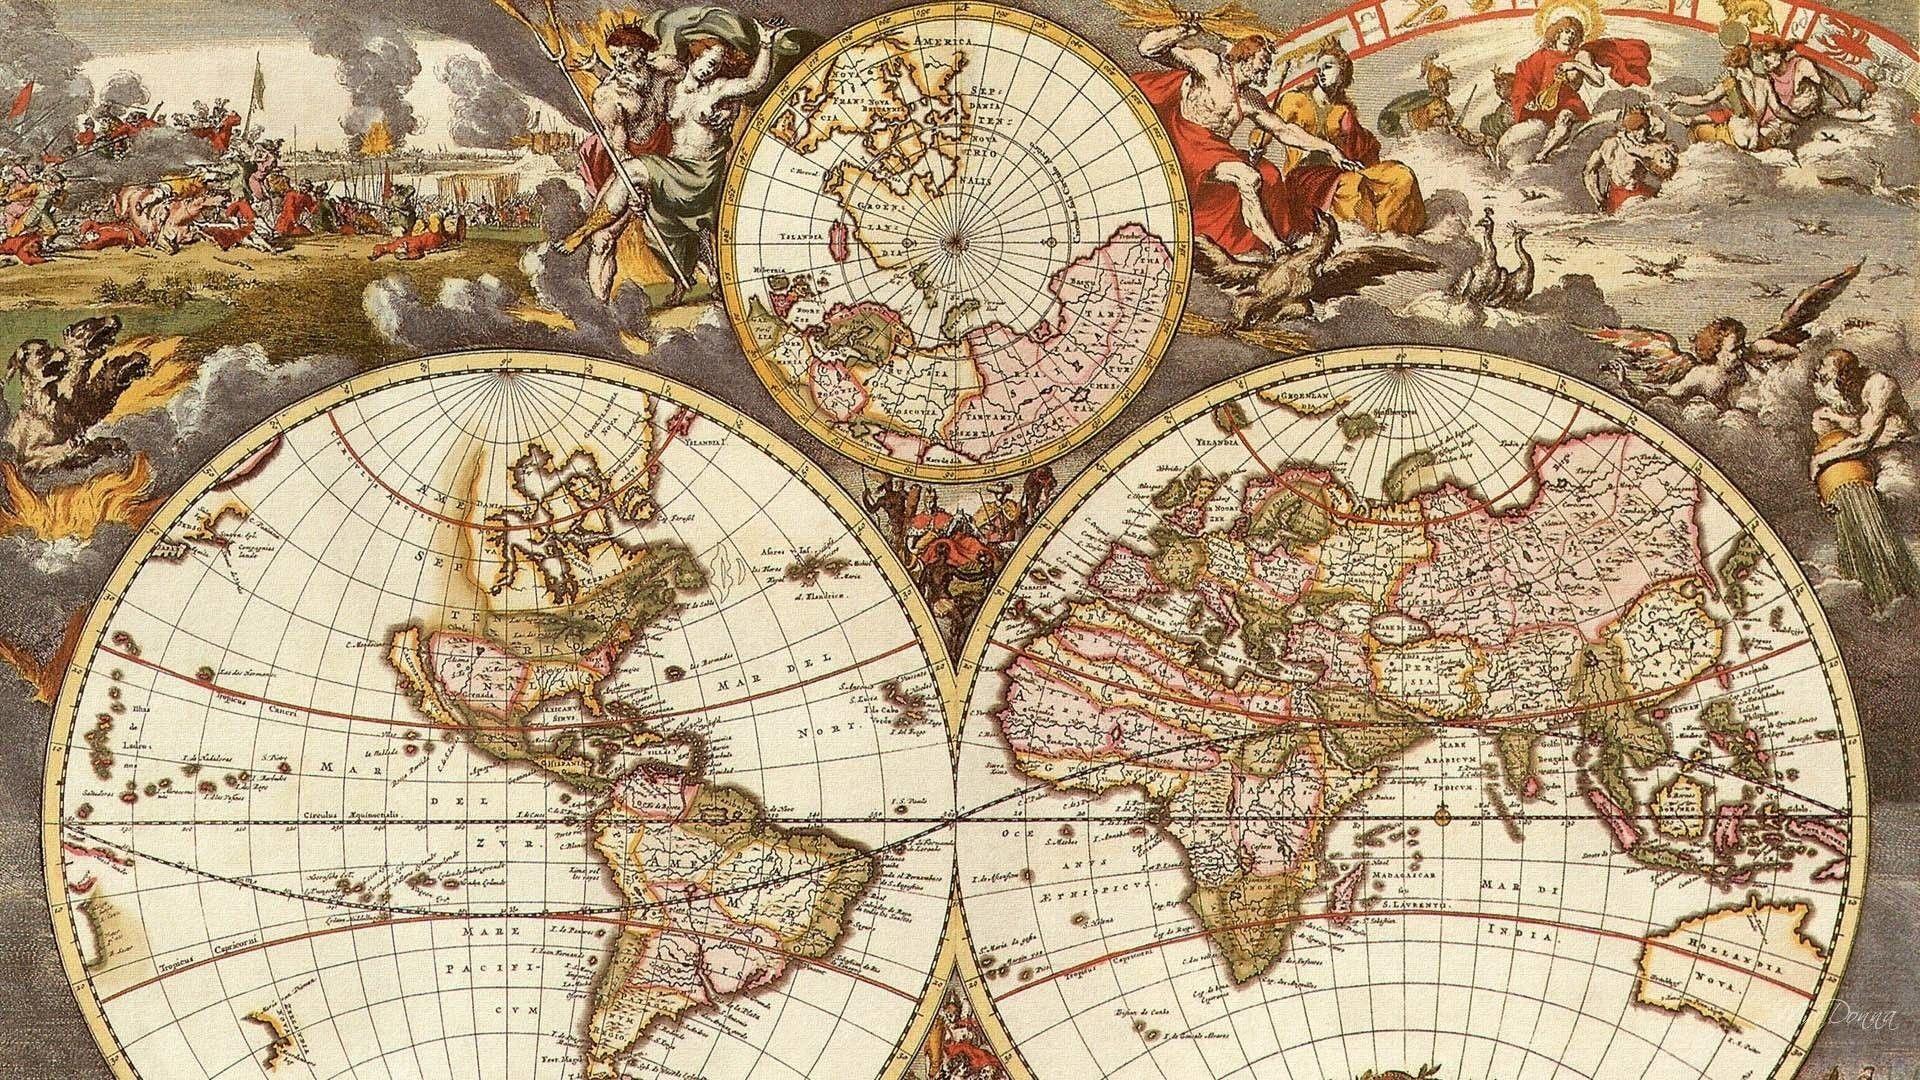 55 Old World Map Desktop Wallpapers   Download at WallpaperBro 1920x1080